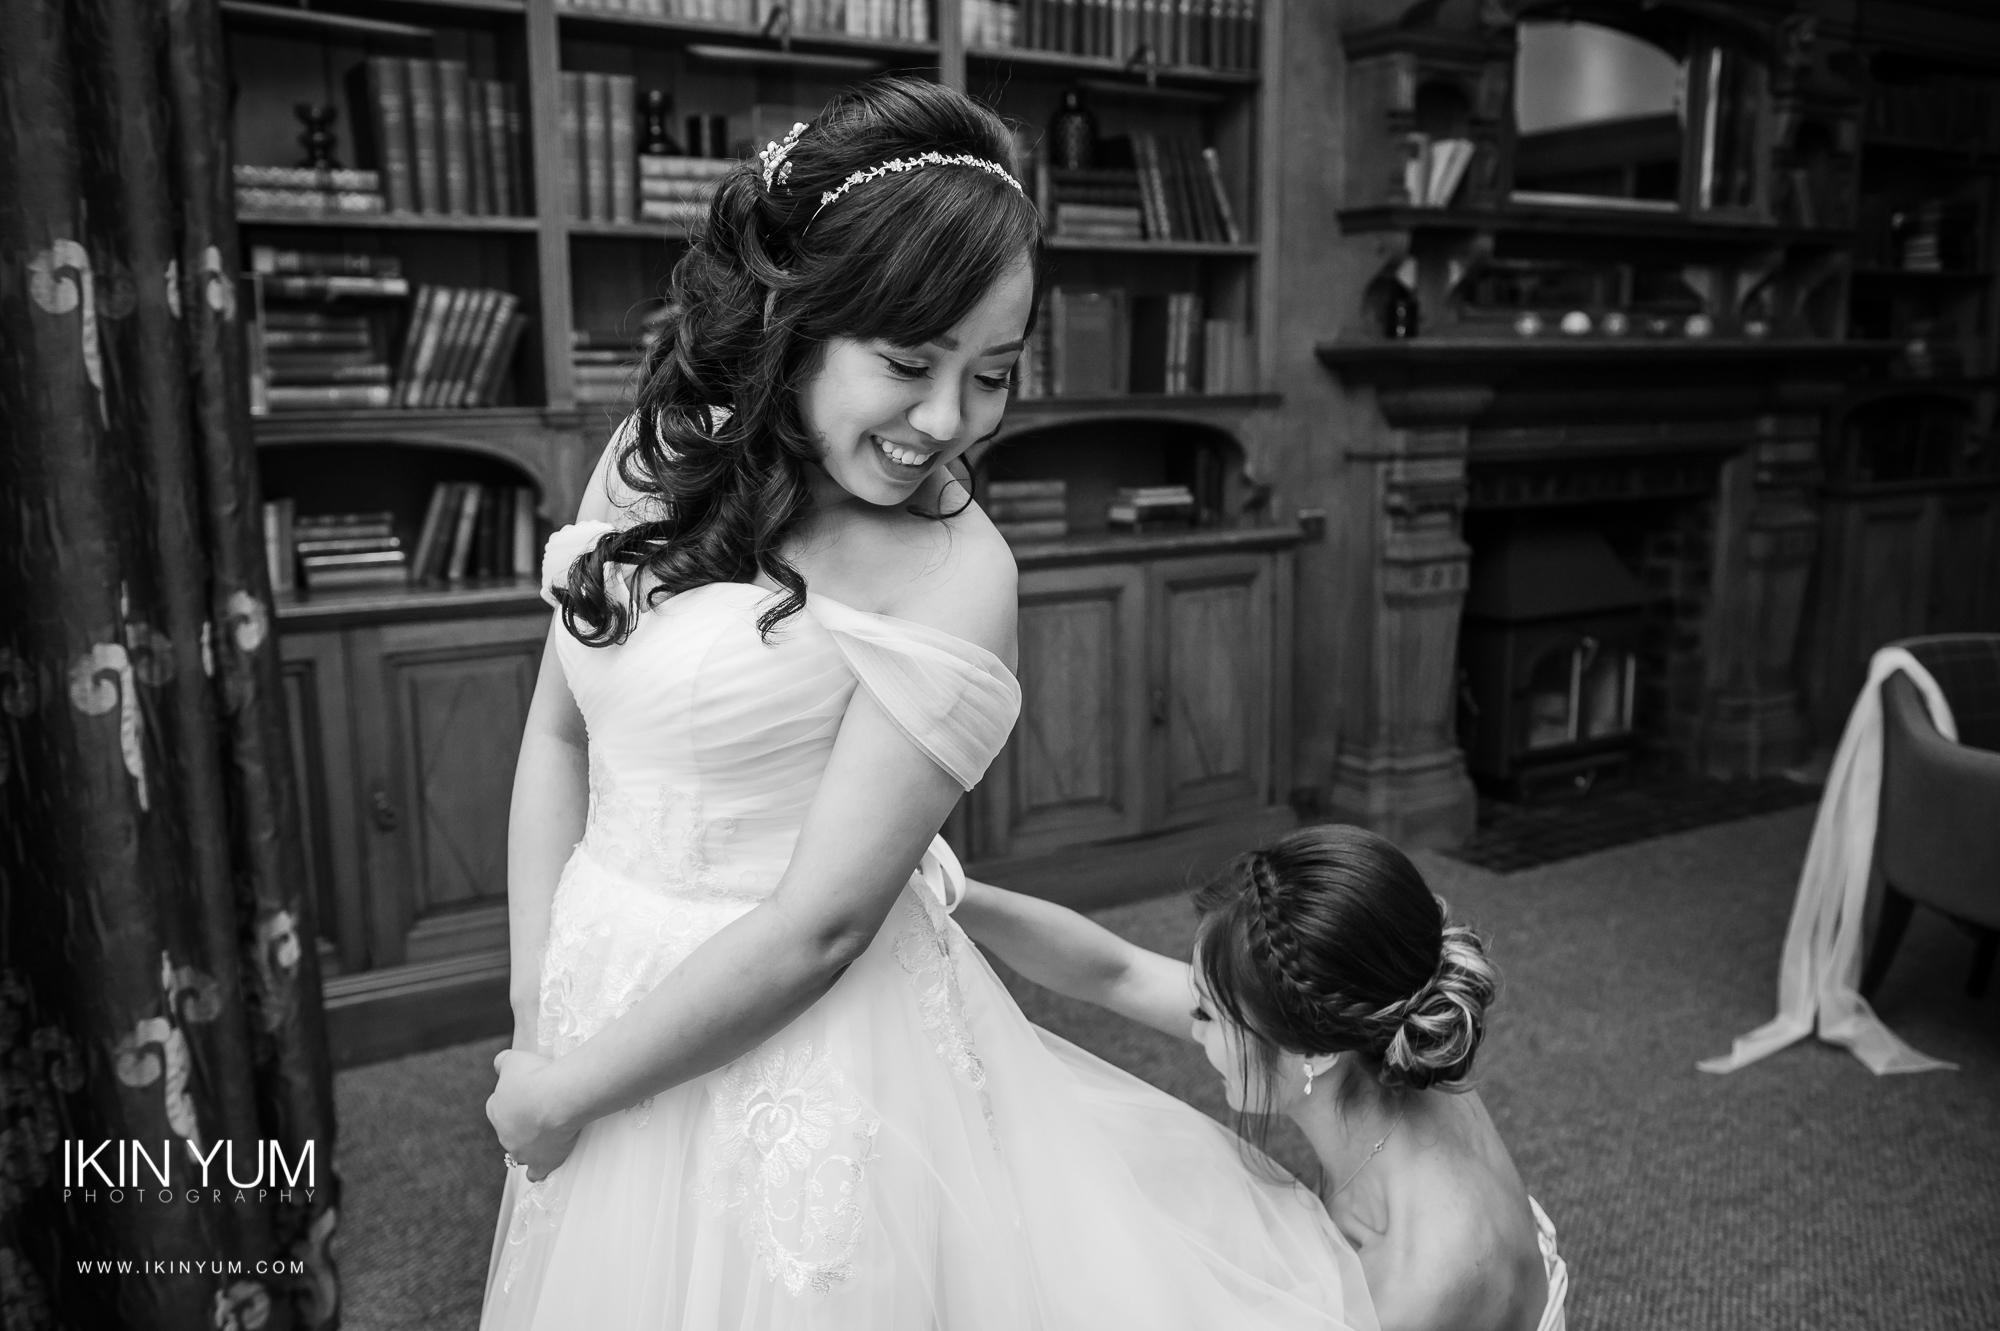 Hampton Manor Wedding - Ikin Yum Photography -055.jpg